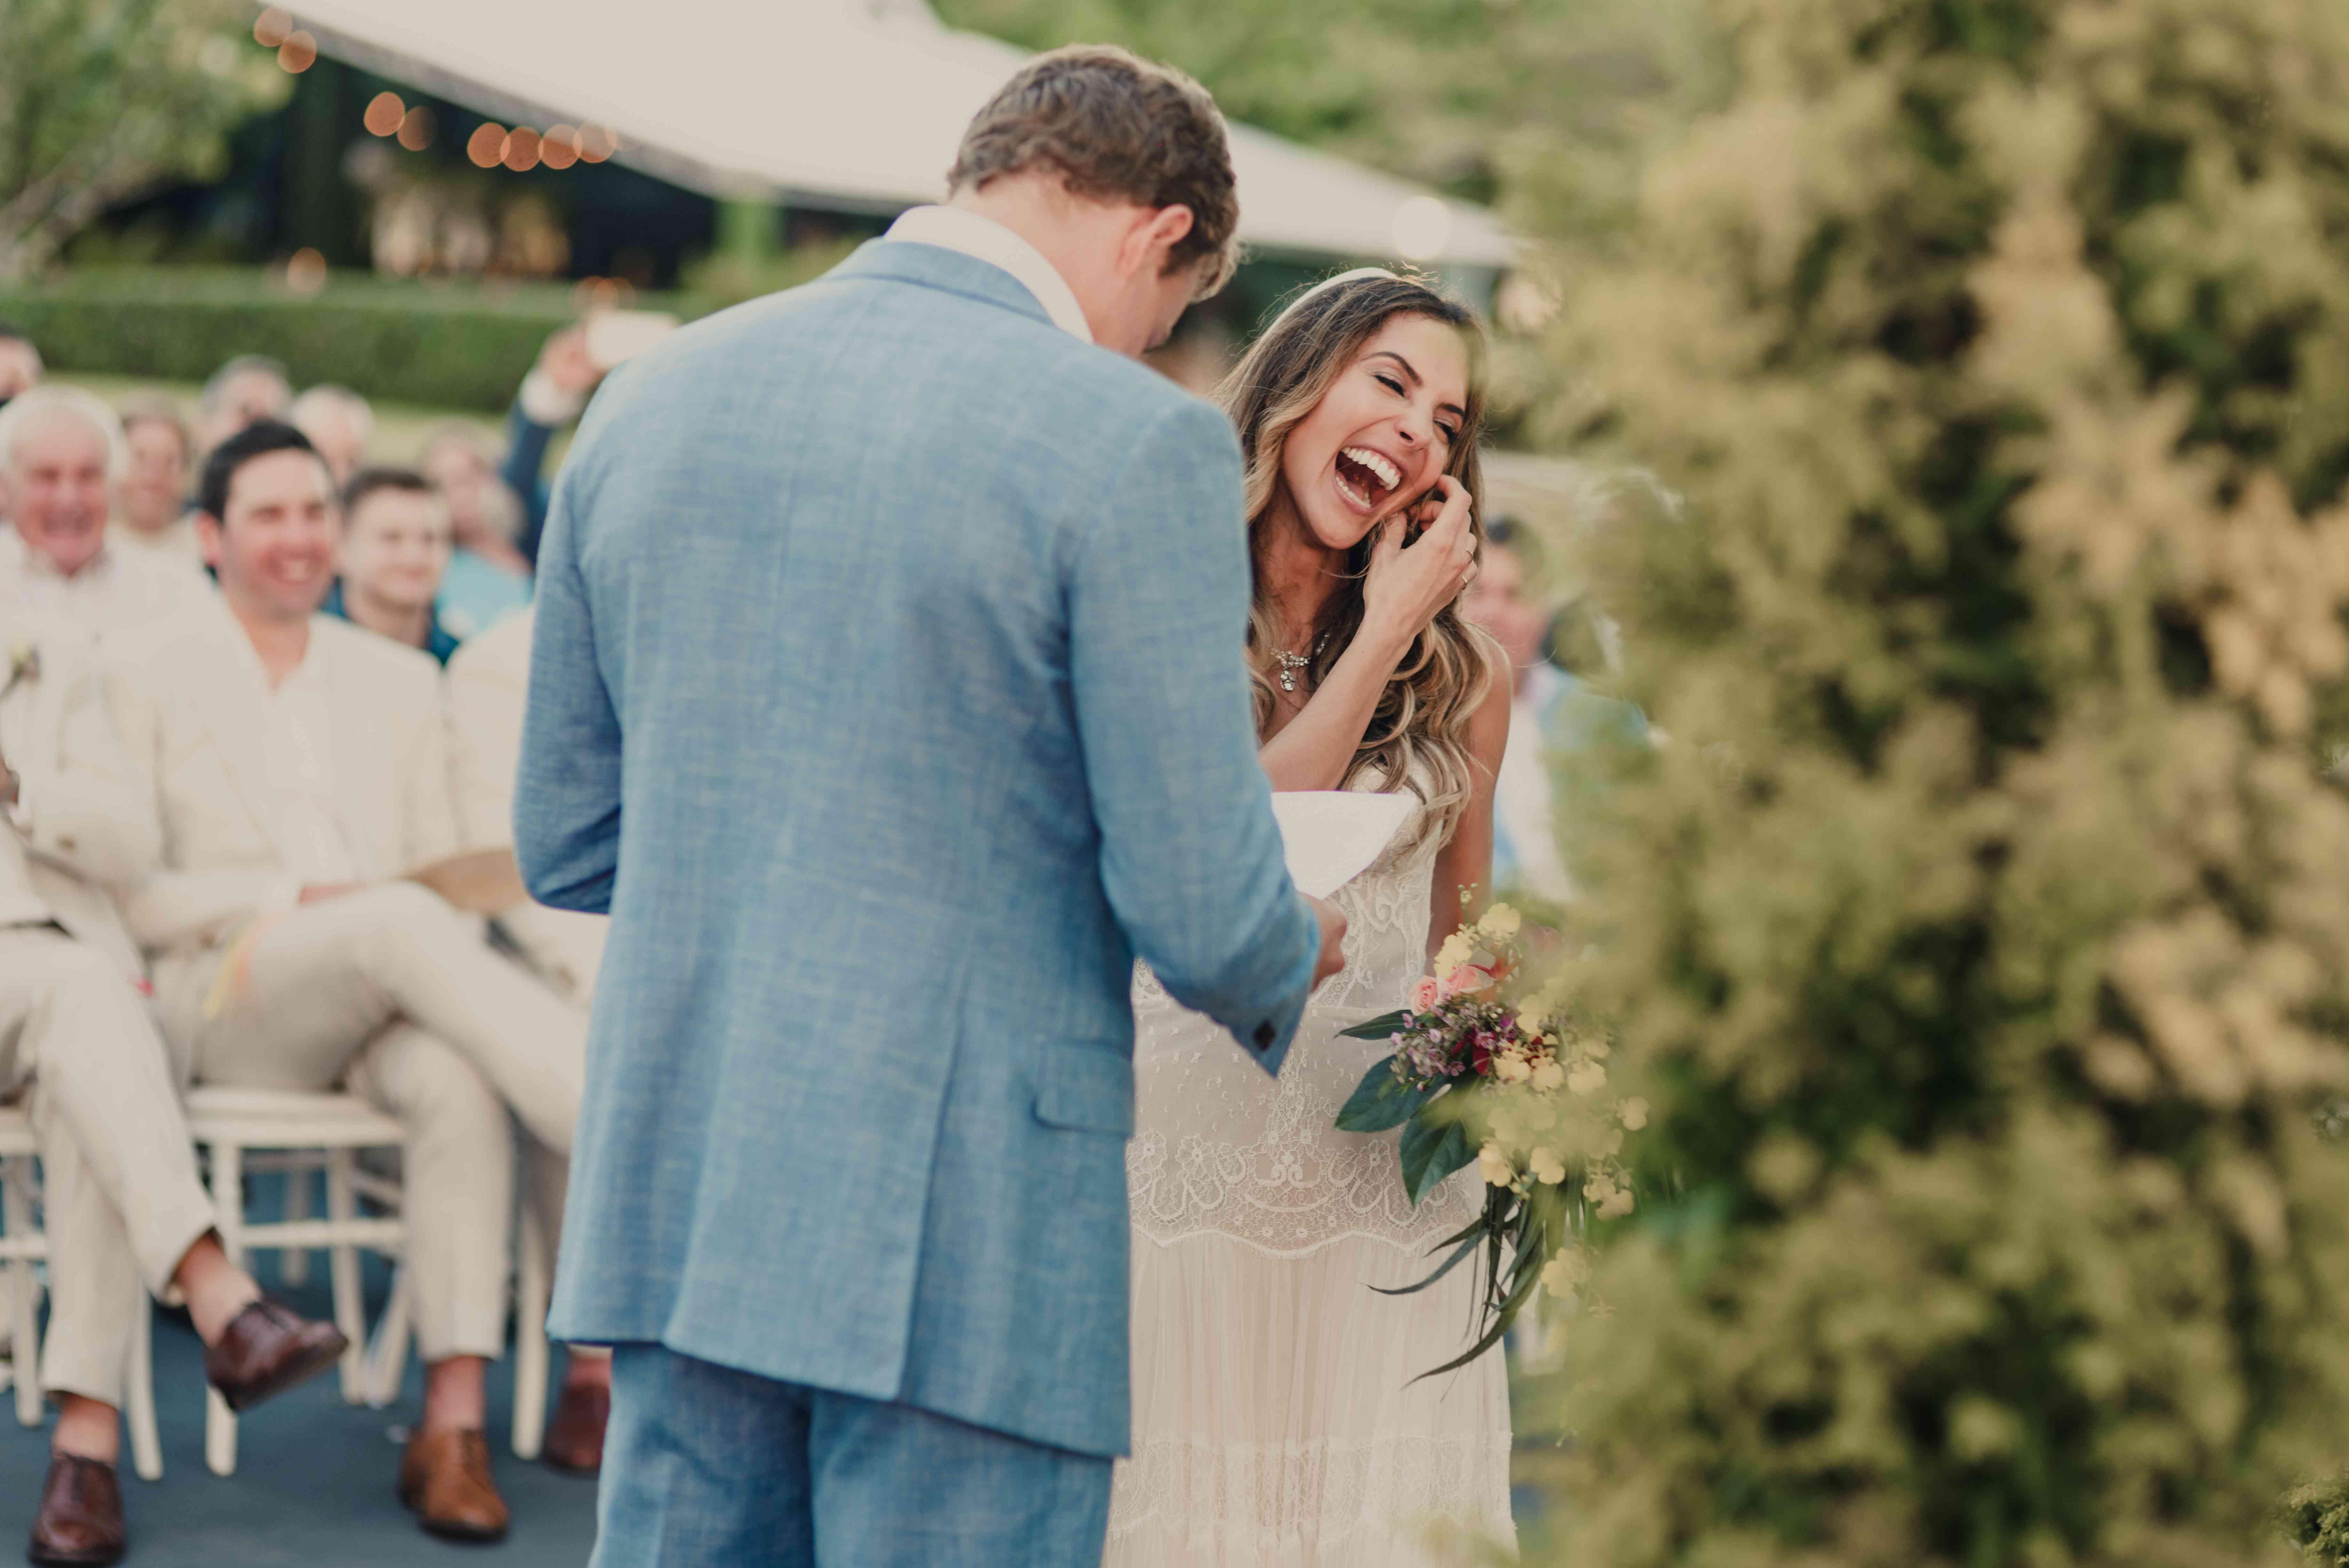 laughing exchanging vows